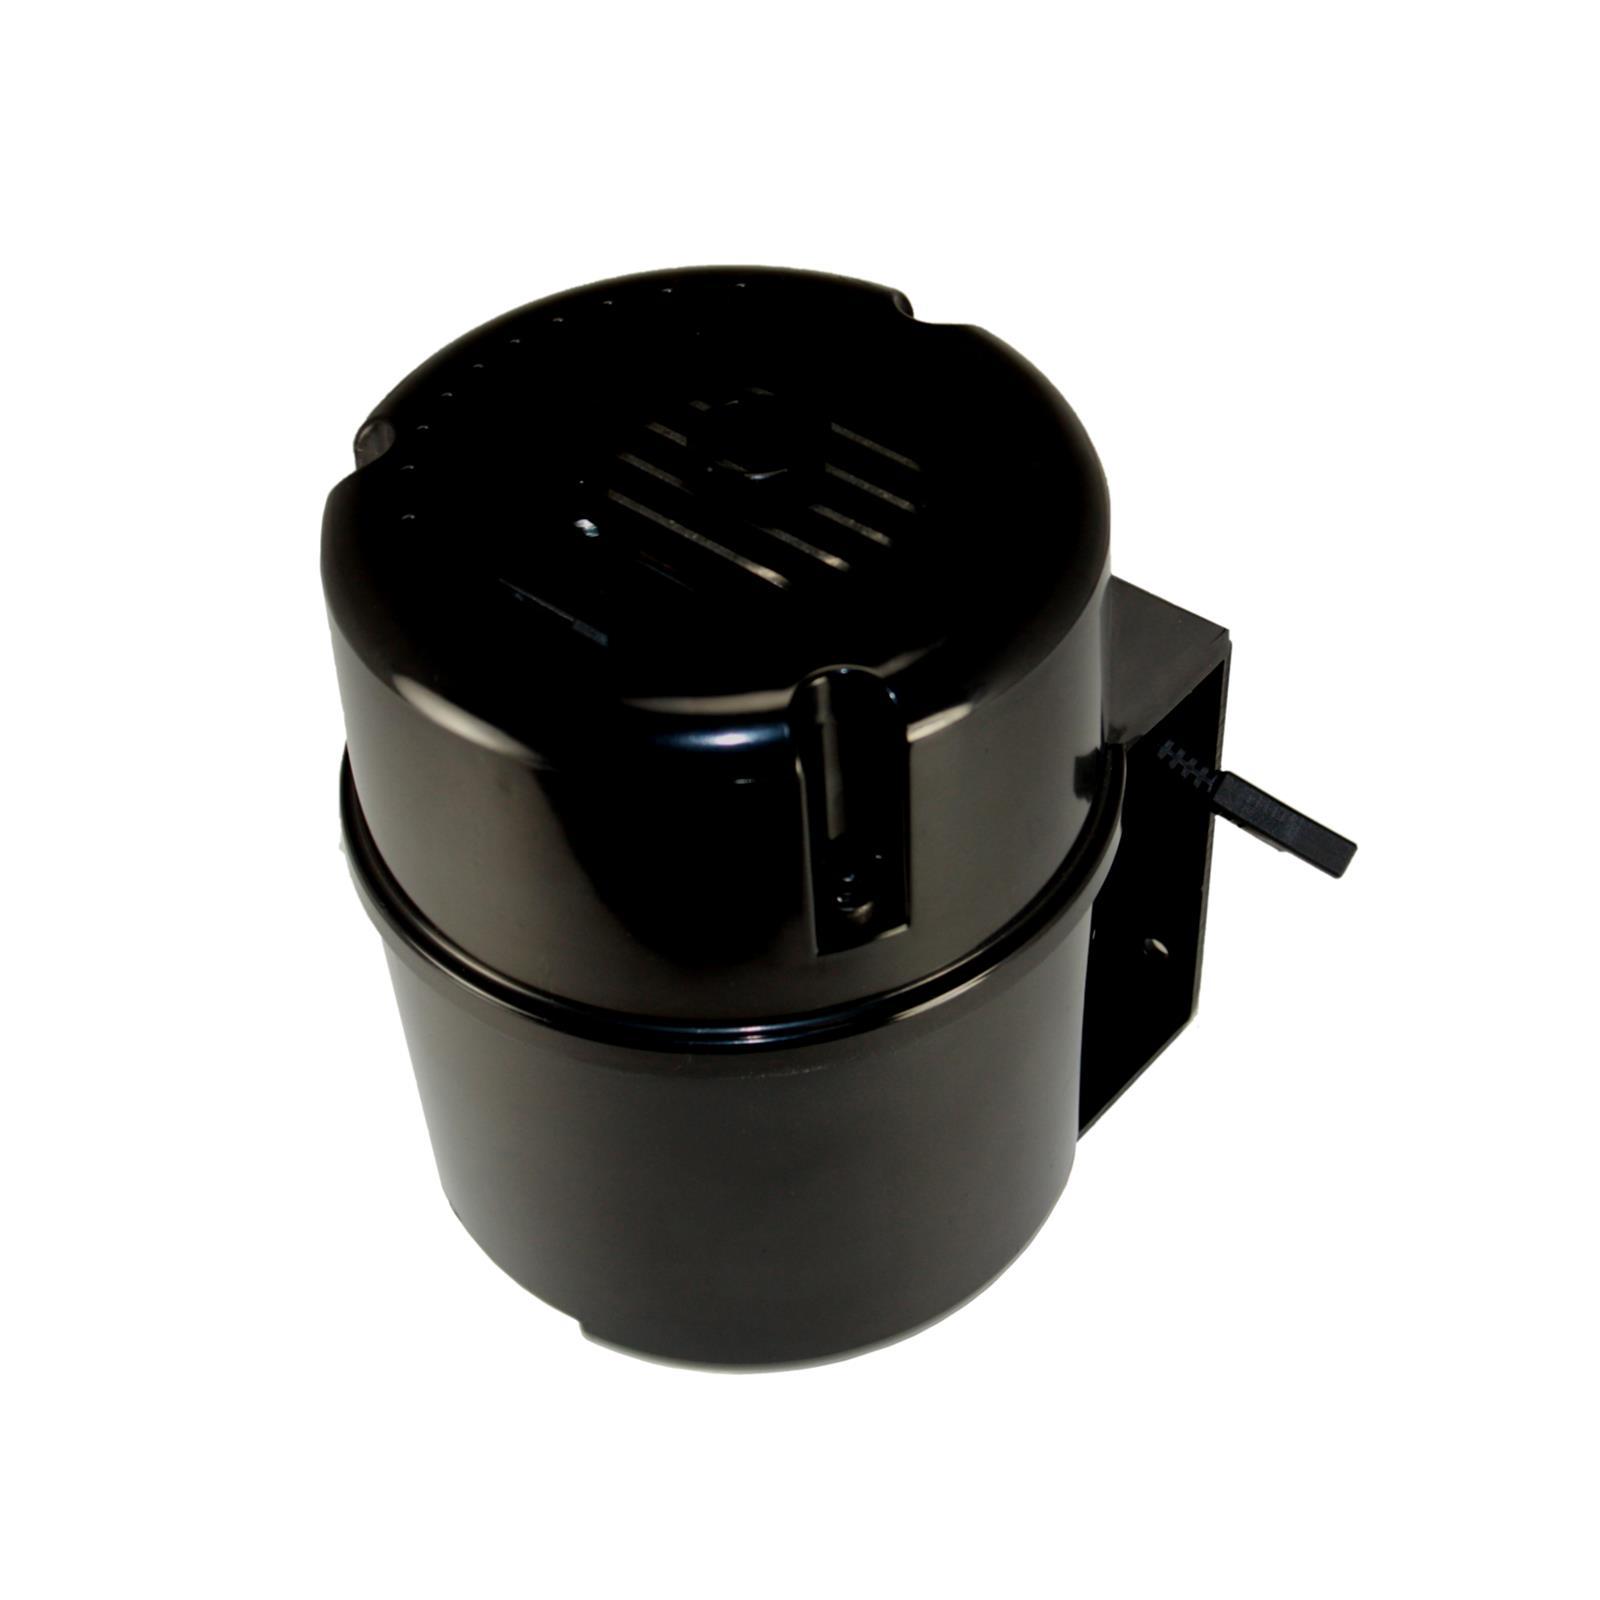 LEED Brakes Bandit Electric Vacuum Pump Kits VP001B